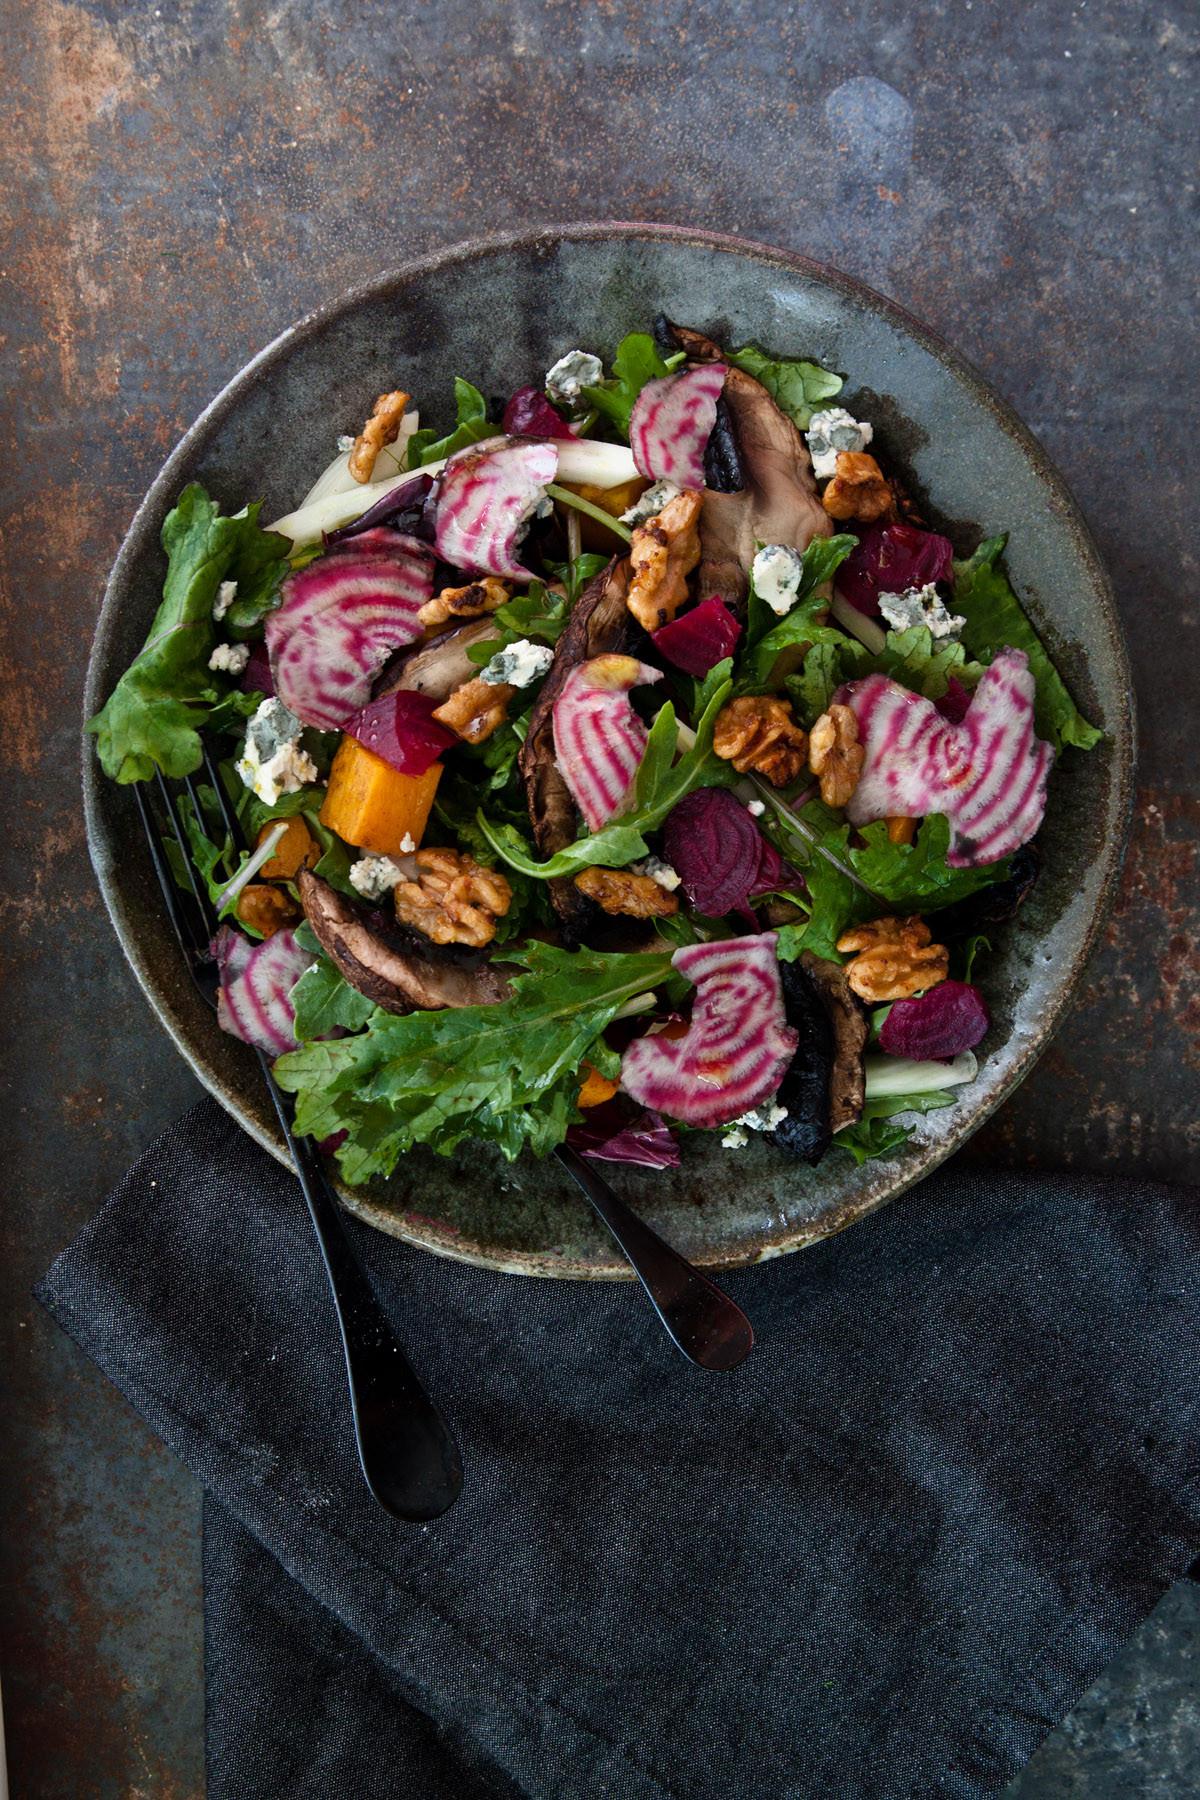 Fall Salad Dressings  Autumn Salad with Shiitake Mushroom Dressing Colavita